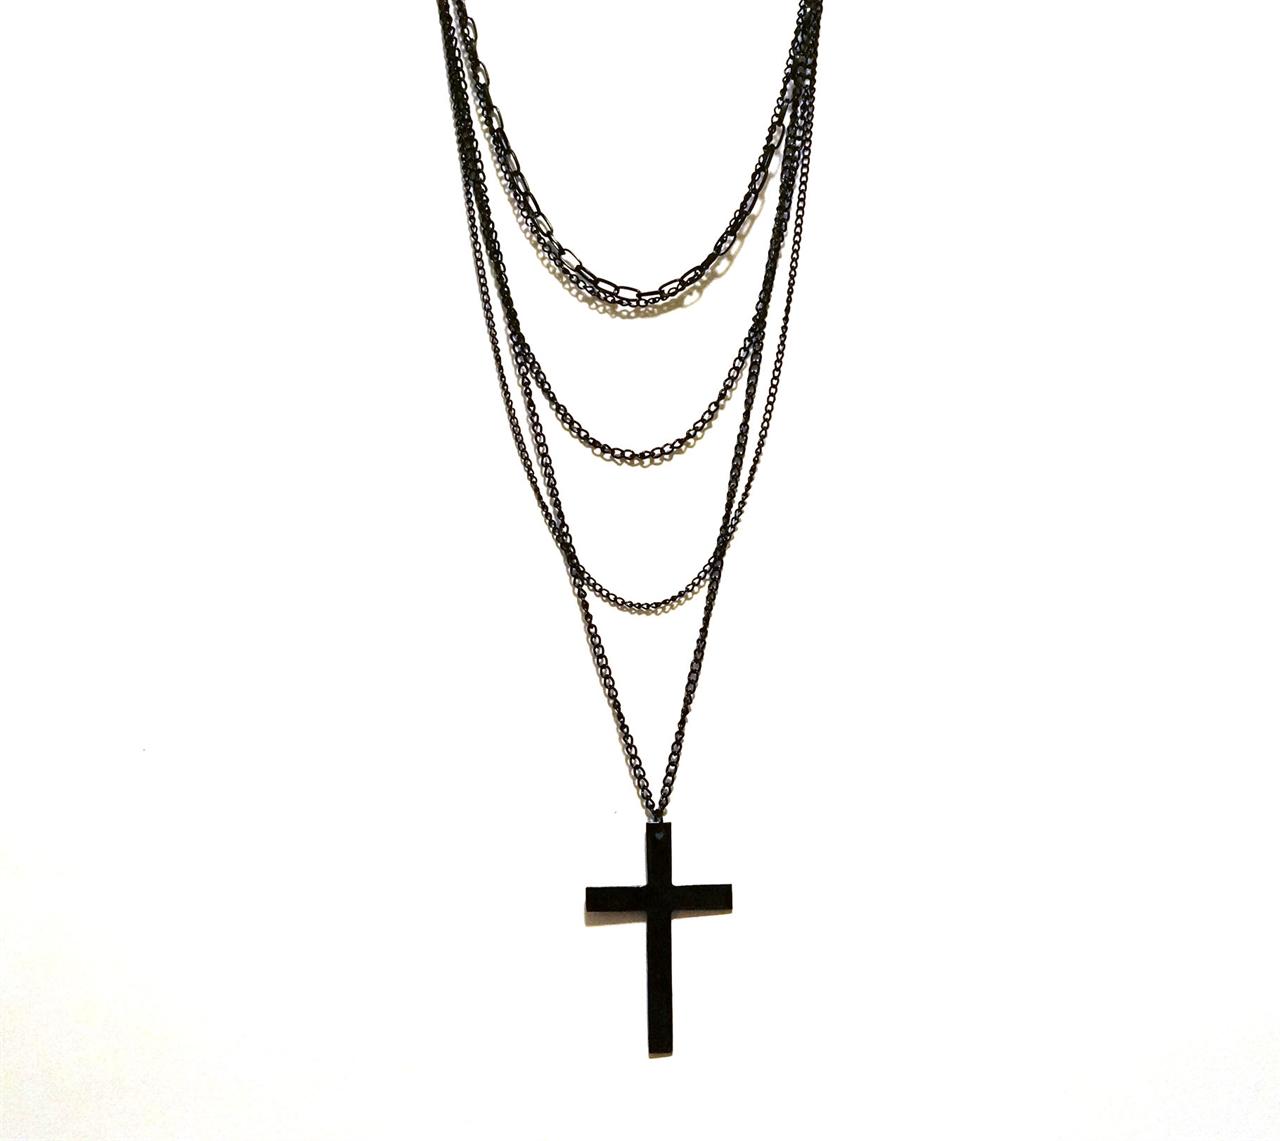 1280x1141 Necklace Clipart